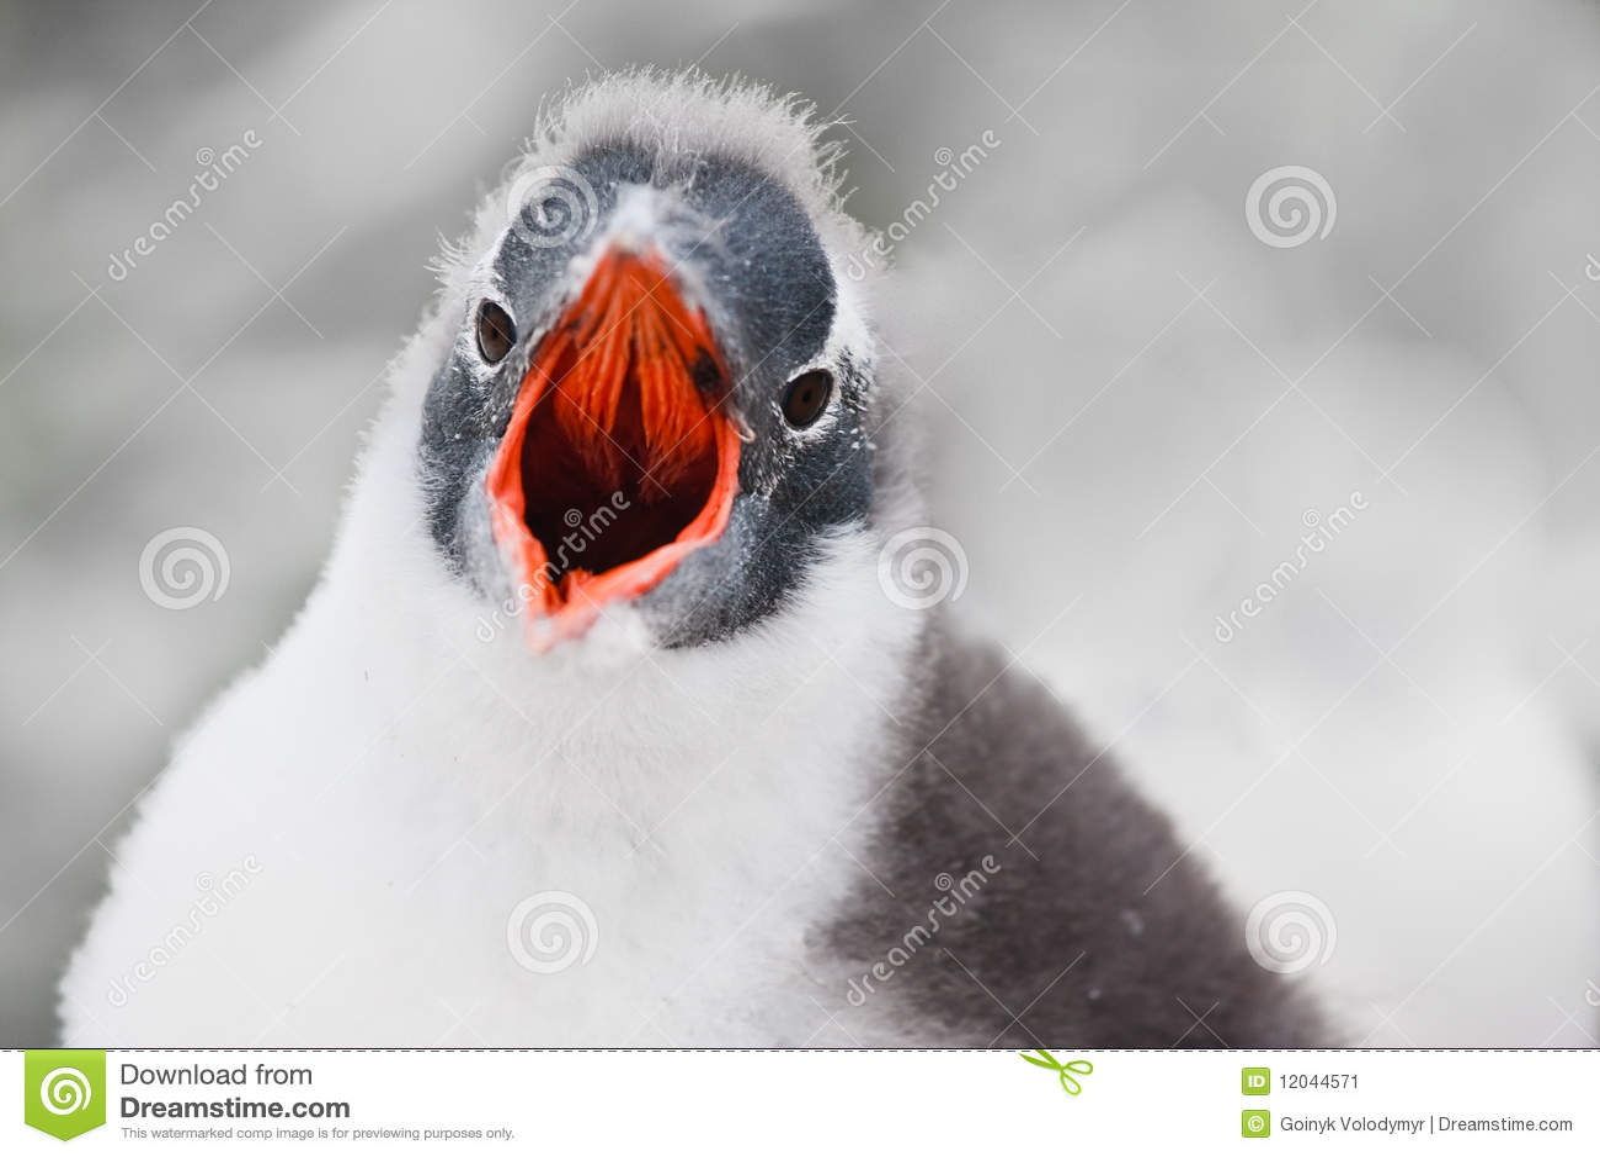 Voz do pinguim